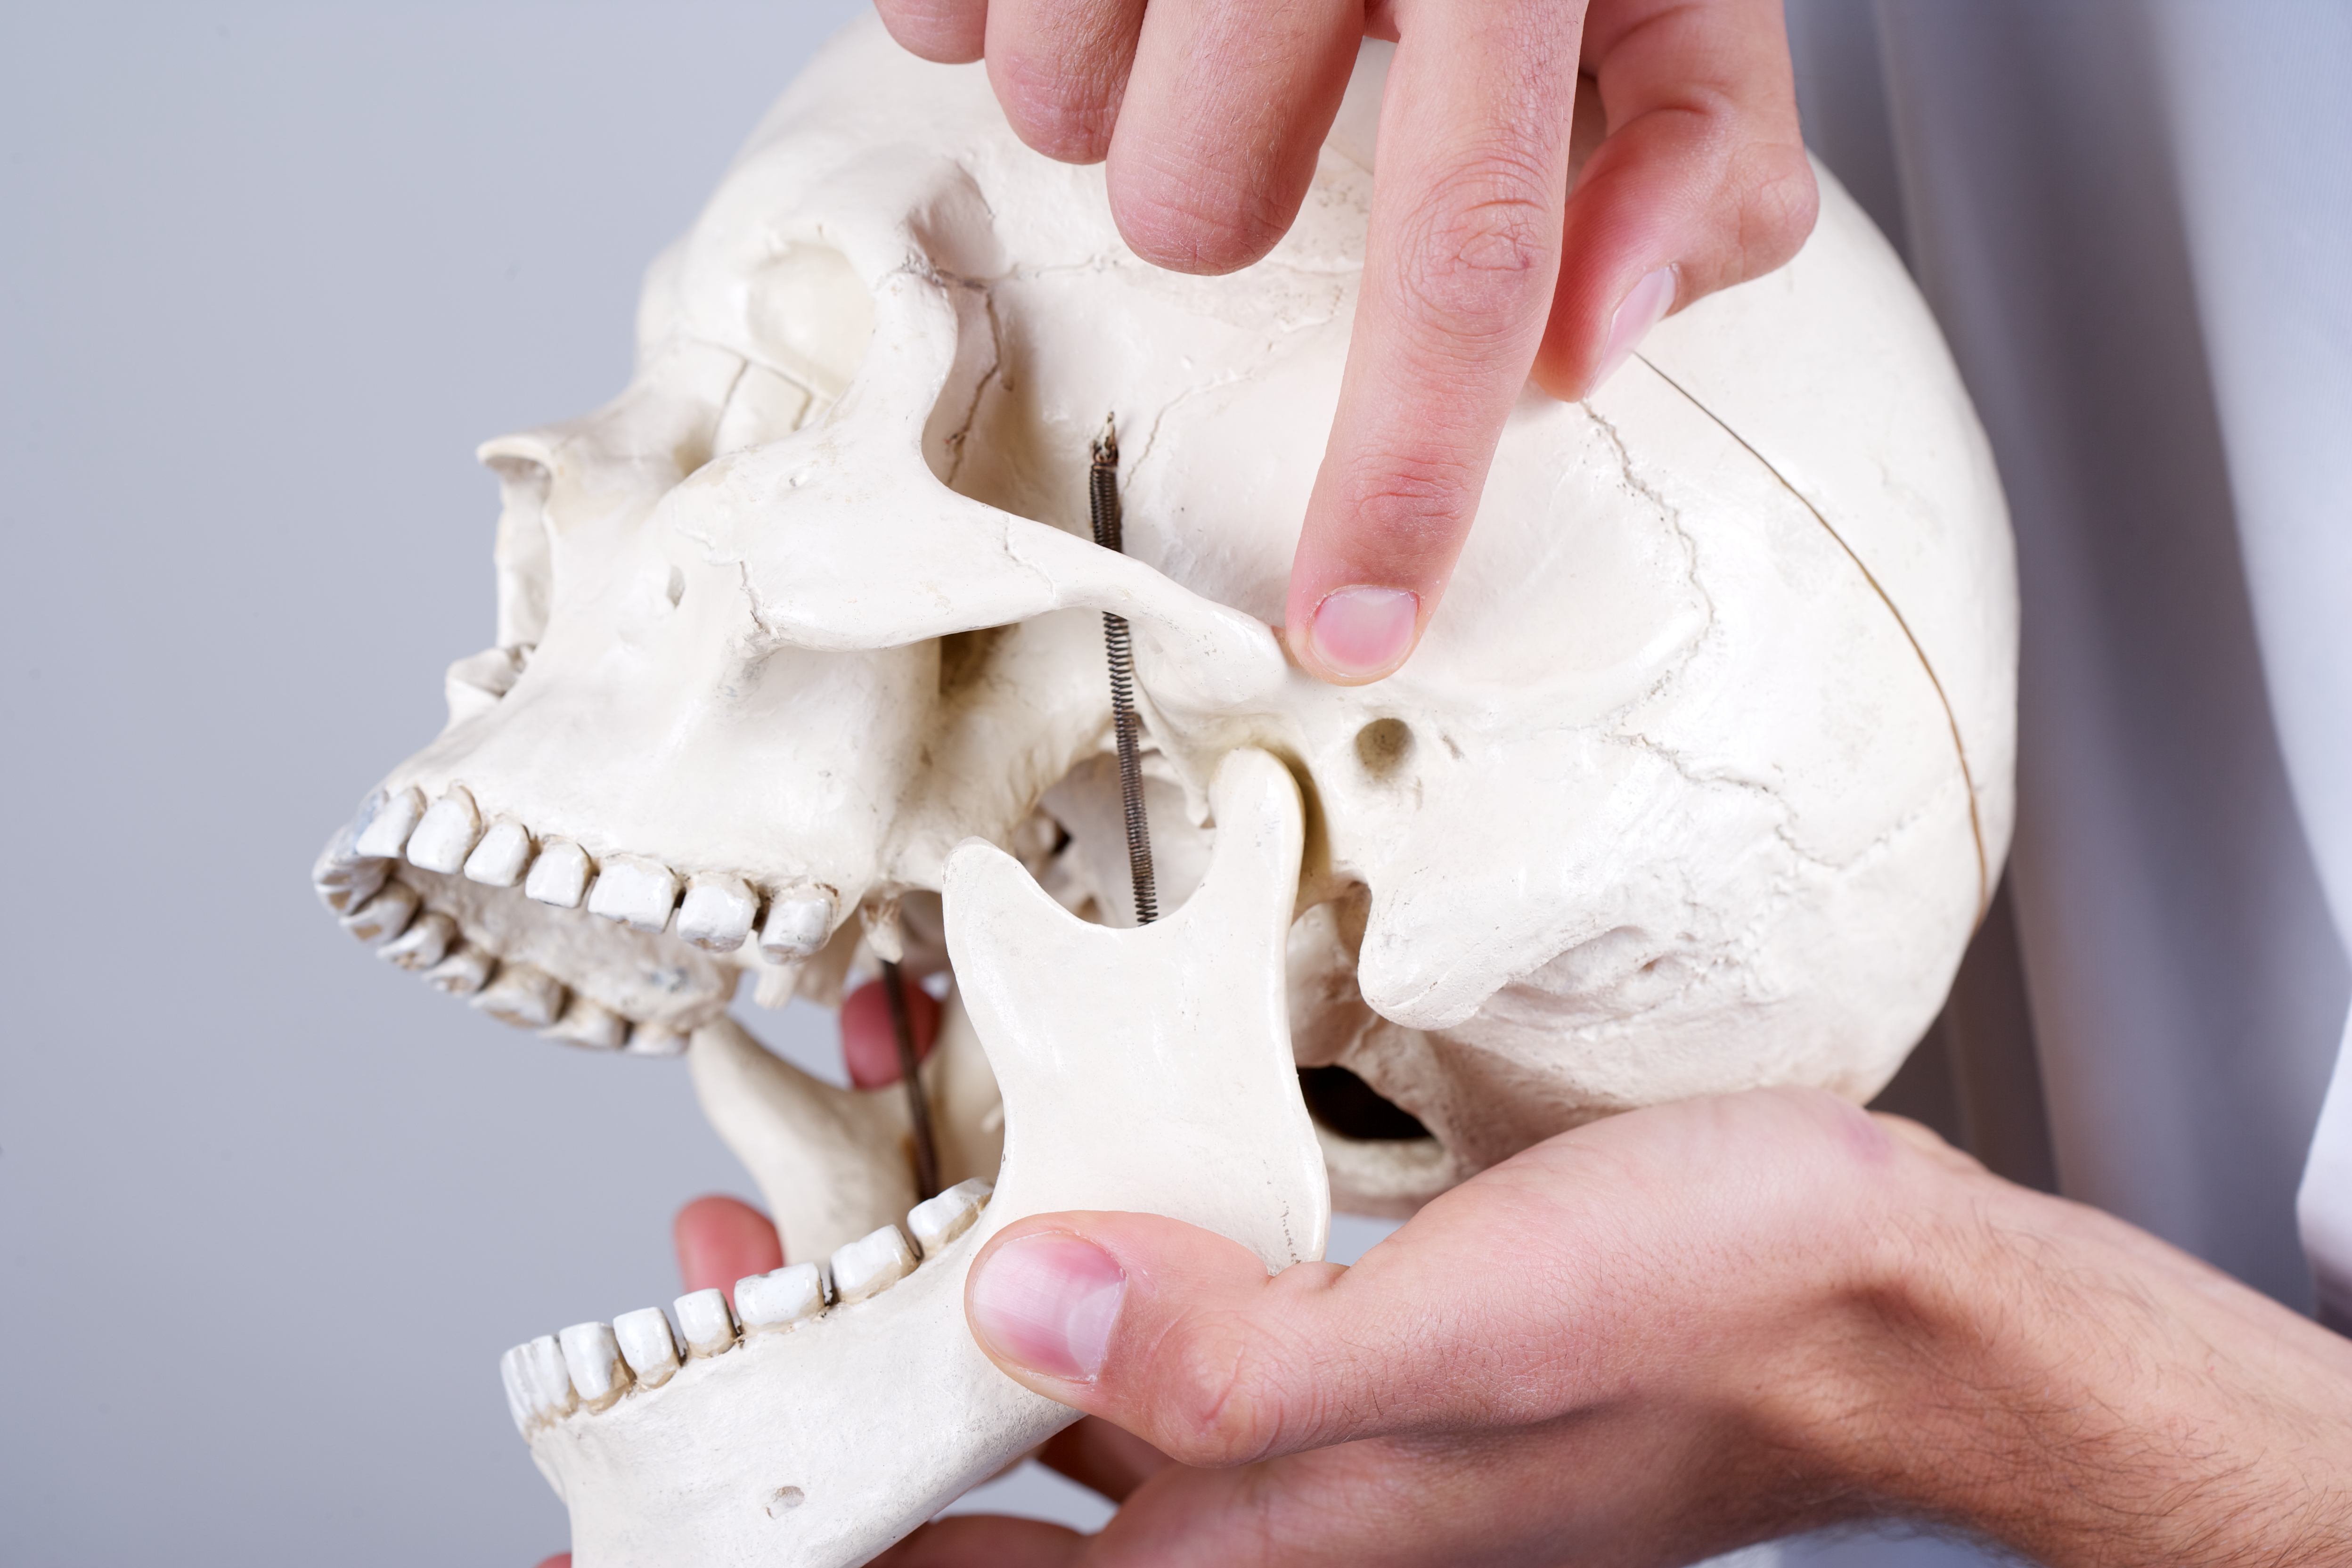 Doctor holding a synthetic skull and pointing at temporomandibular joint (articulation temporomandibularis).